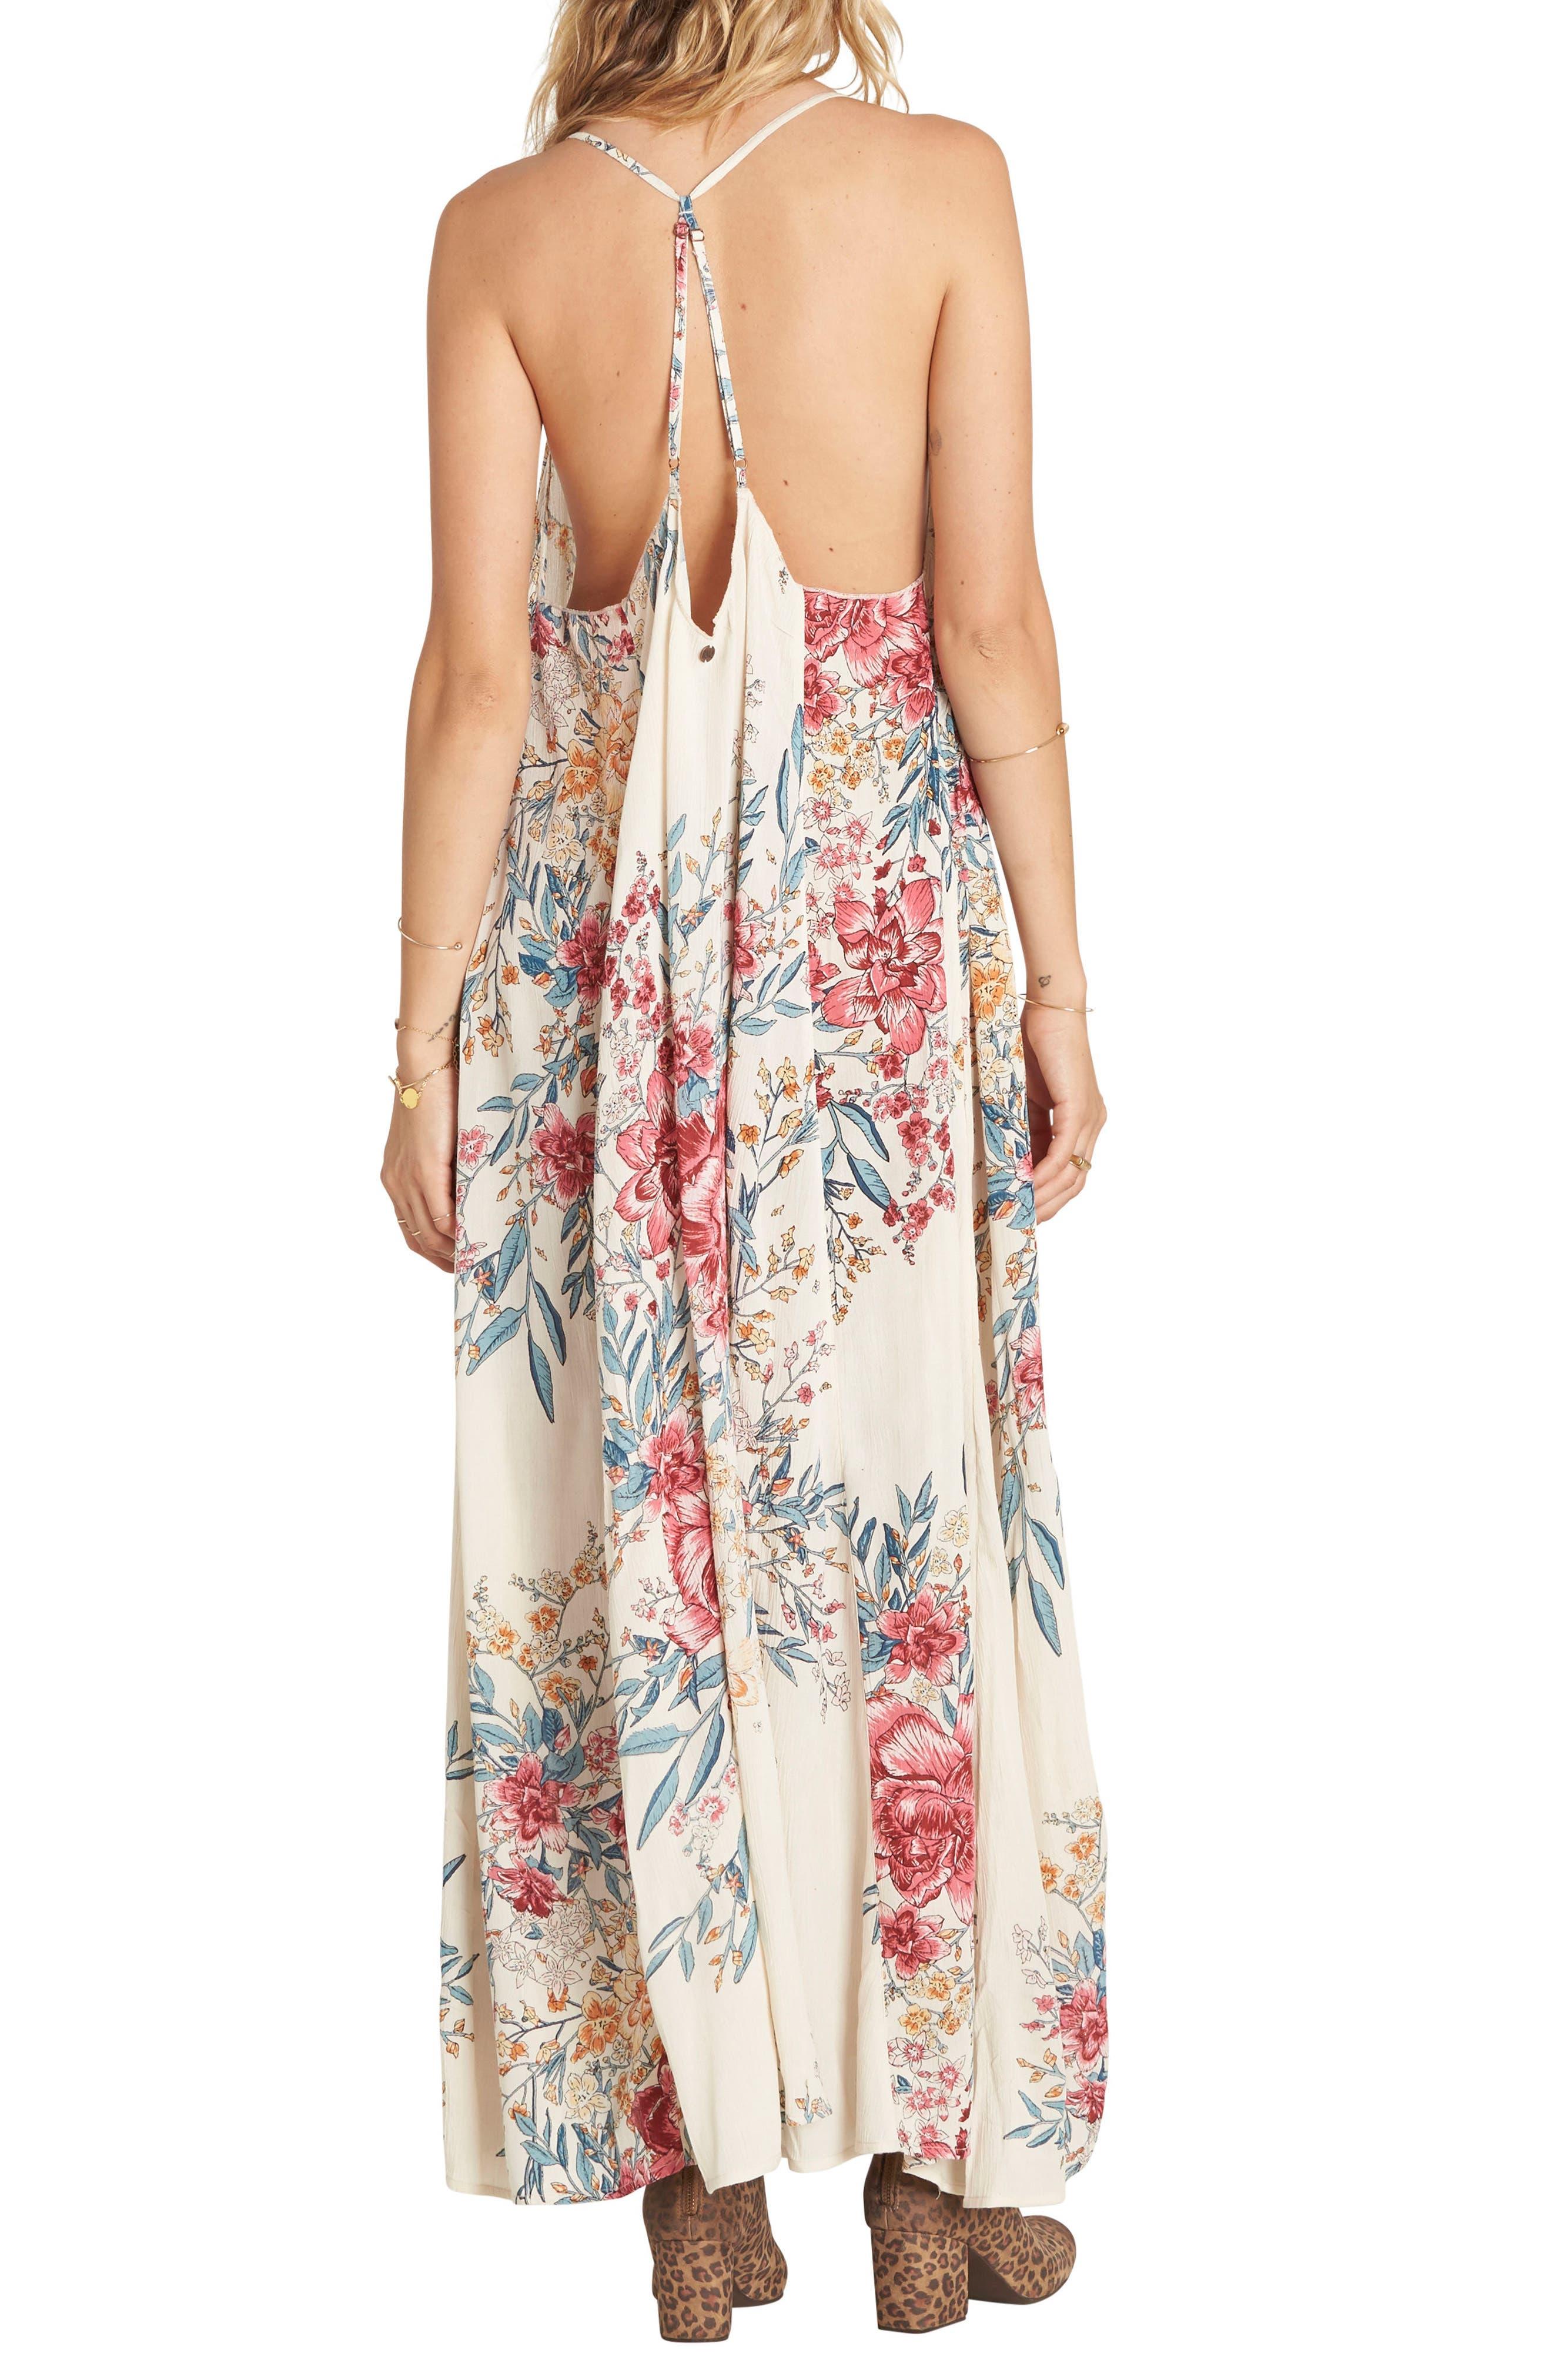 San Sebonne Floral Print Maxi Dress,                             Alternate thumbnail 2, color,                             Ivory